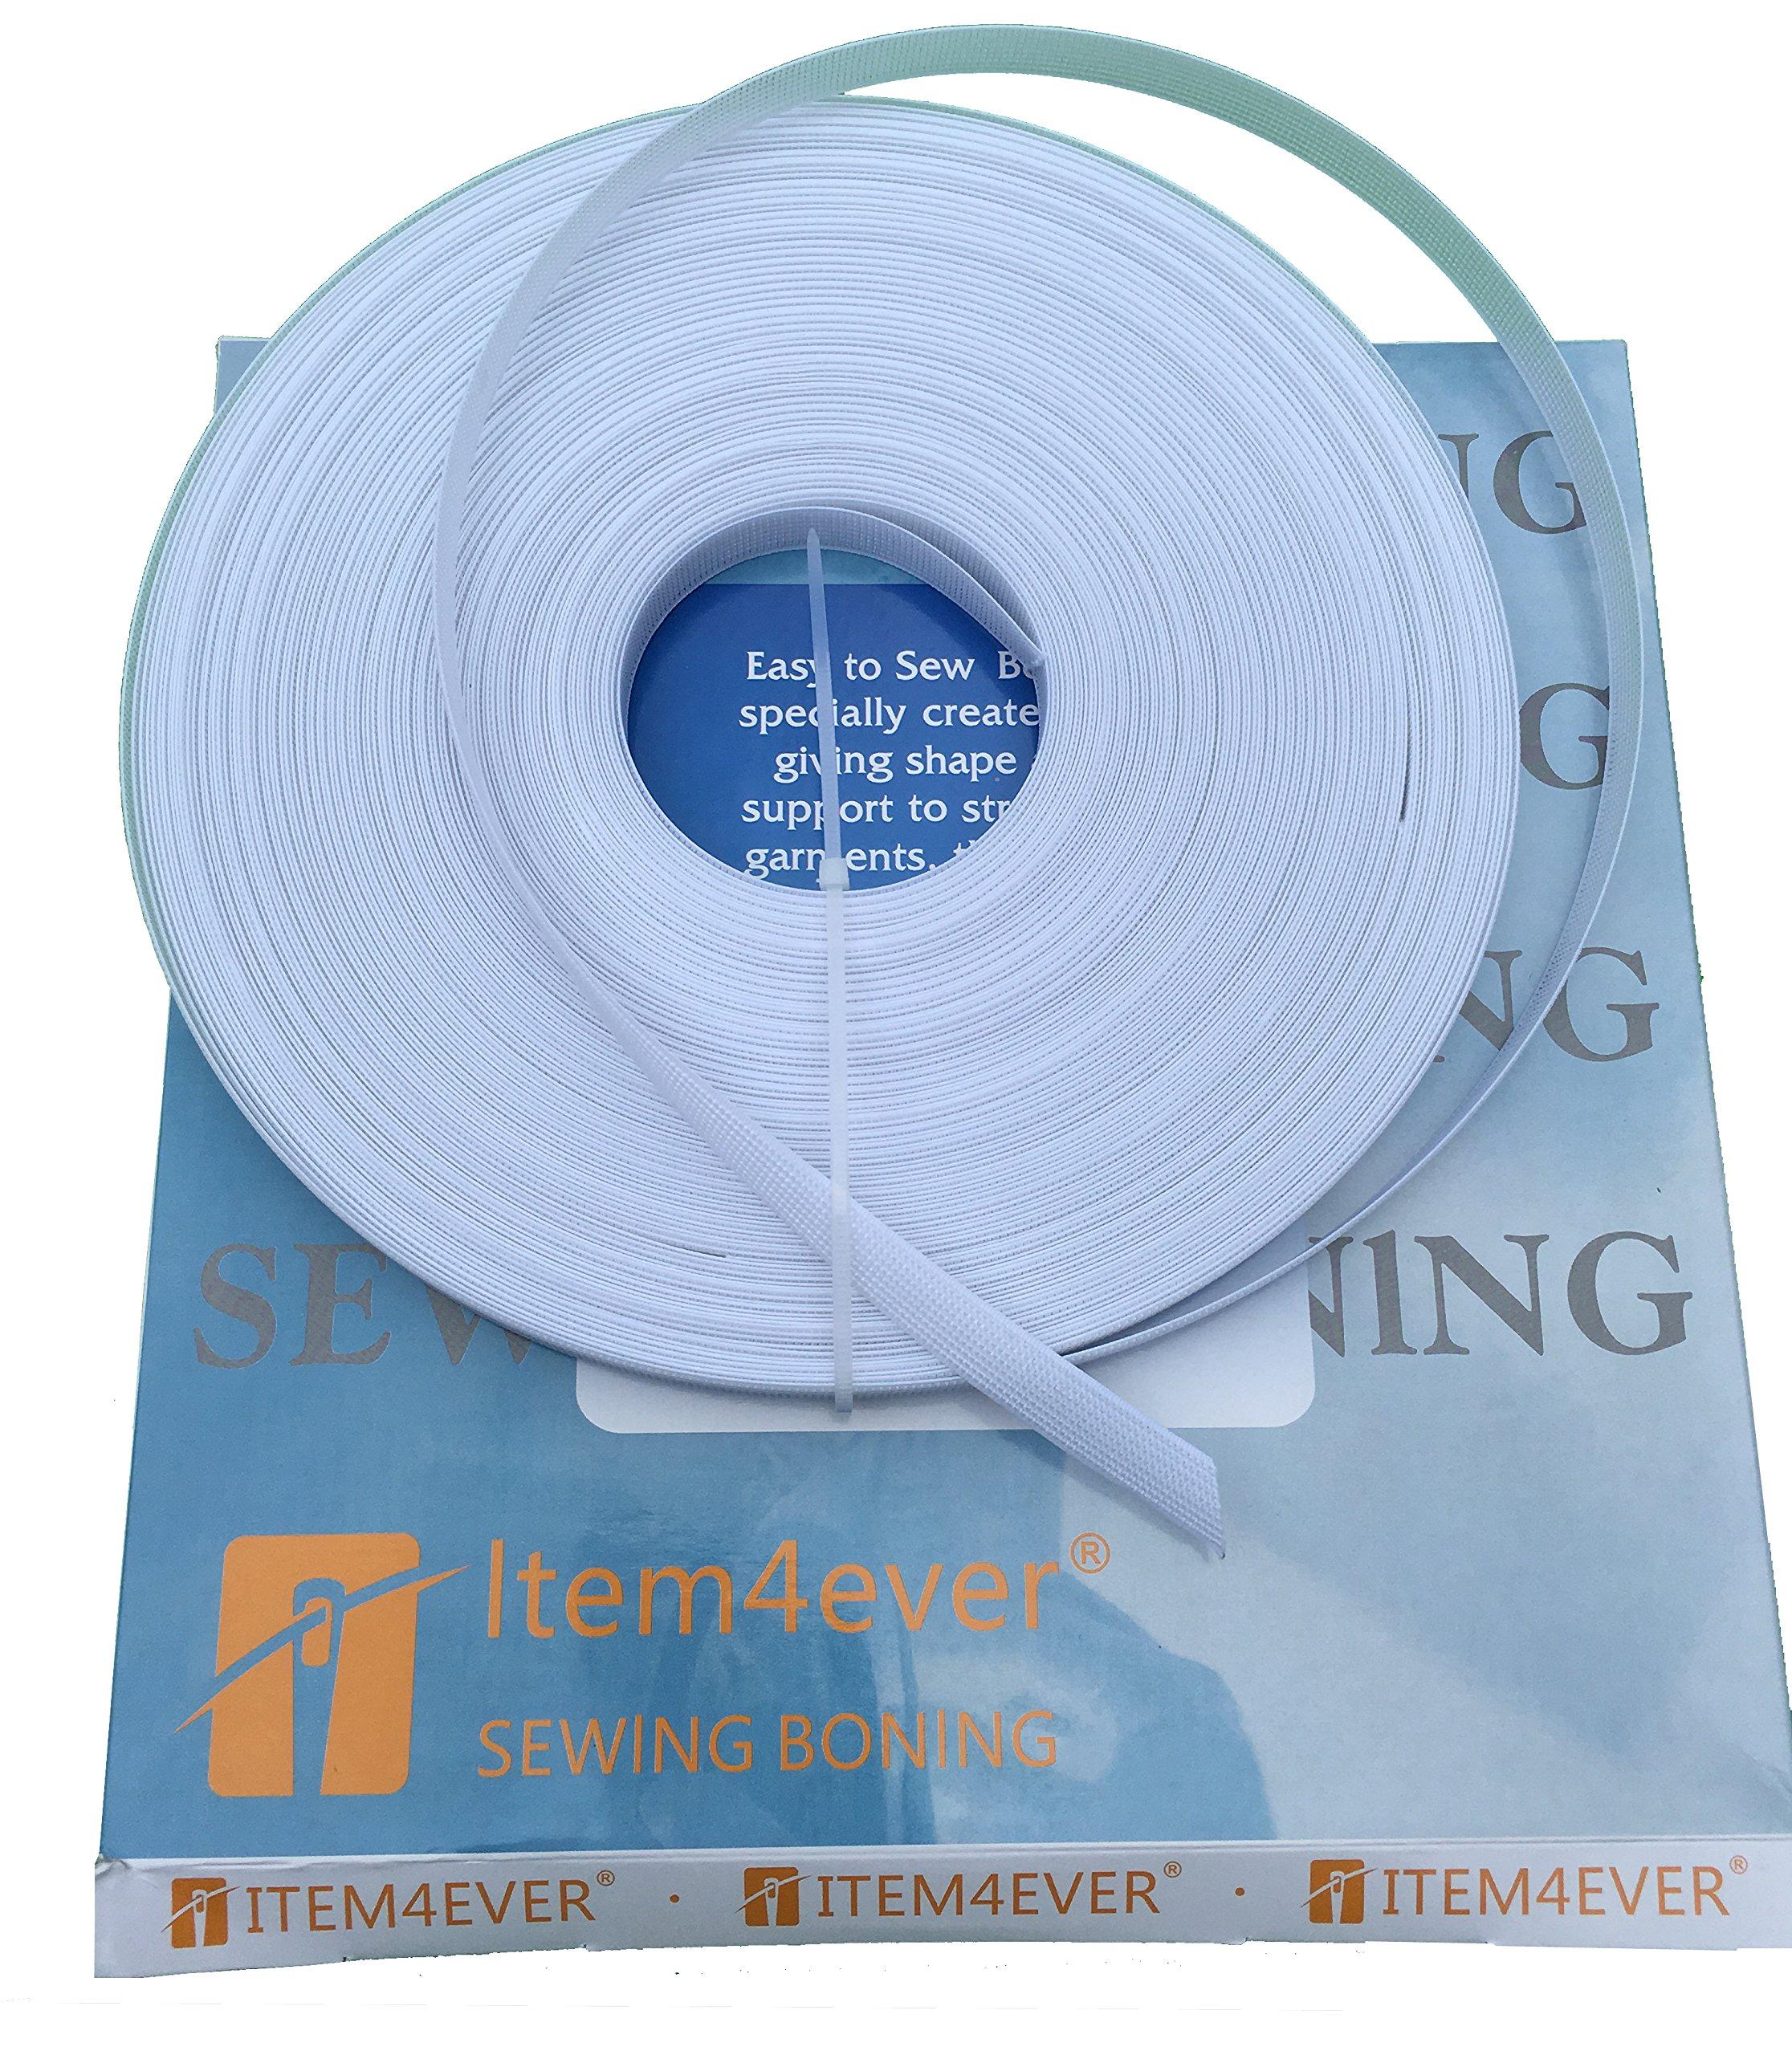 50yds Rigilene Poly Polyester Boning - Item4ever (1/4'', White) by item4ever